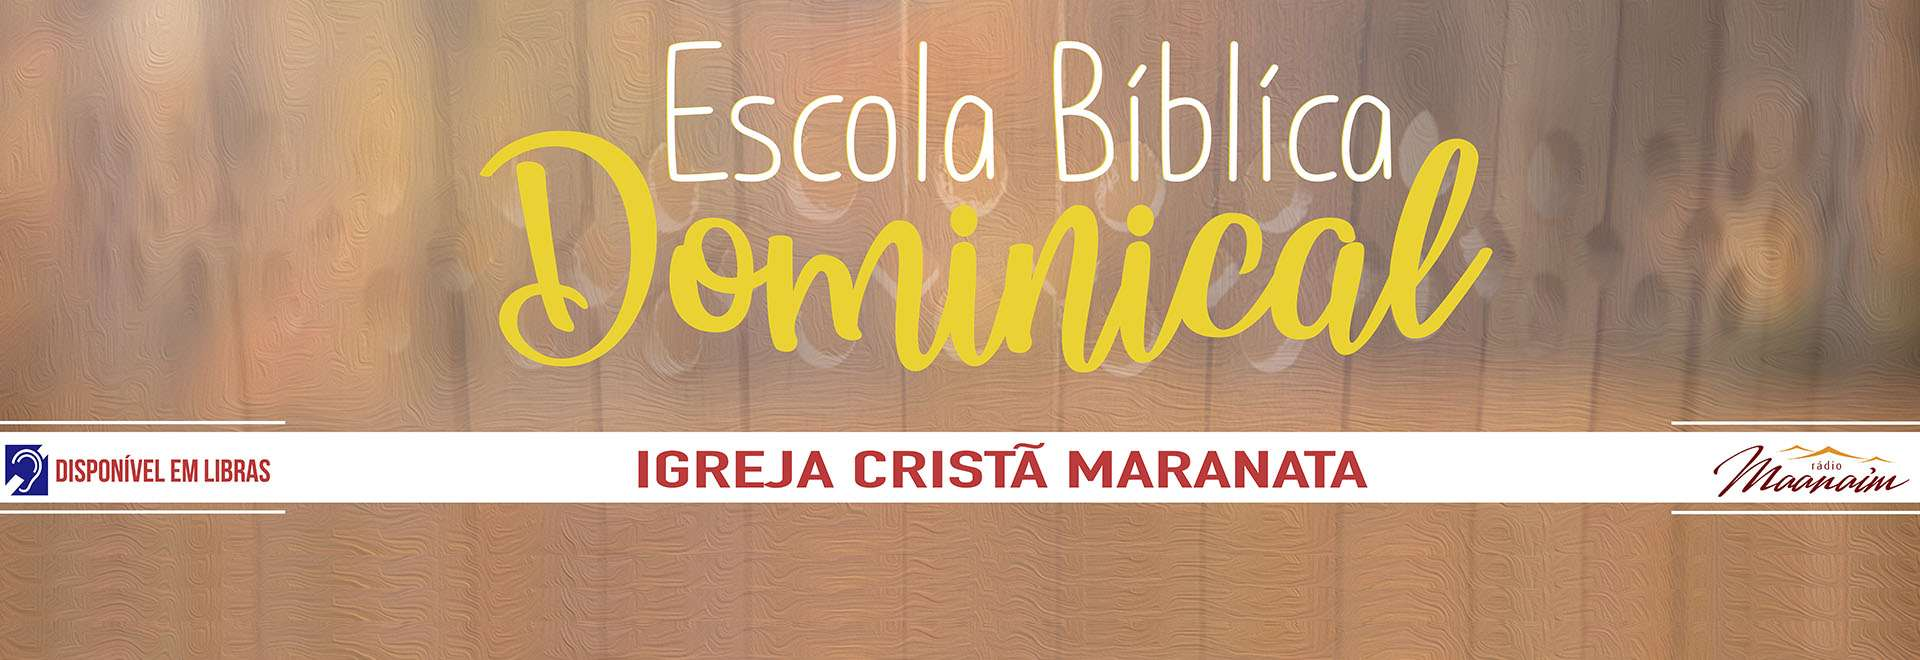 Participações da EBD da Igreja Cristã Maranata - 17/01/2020